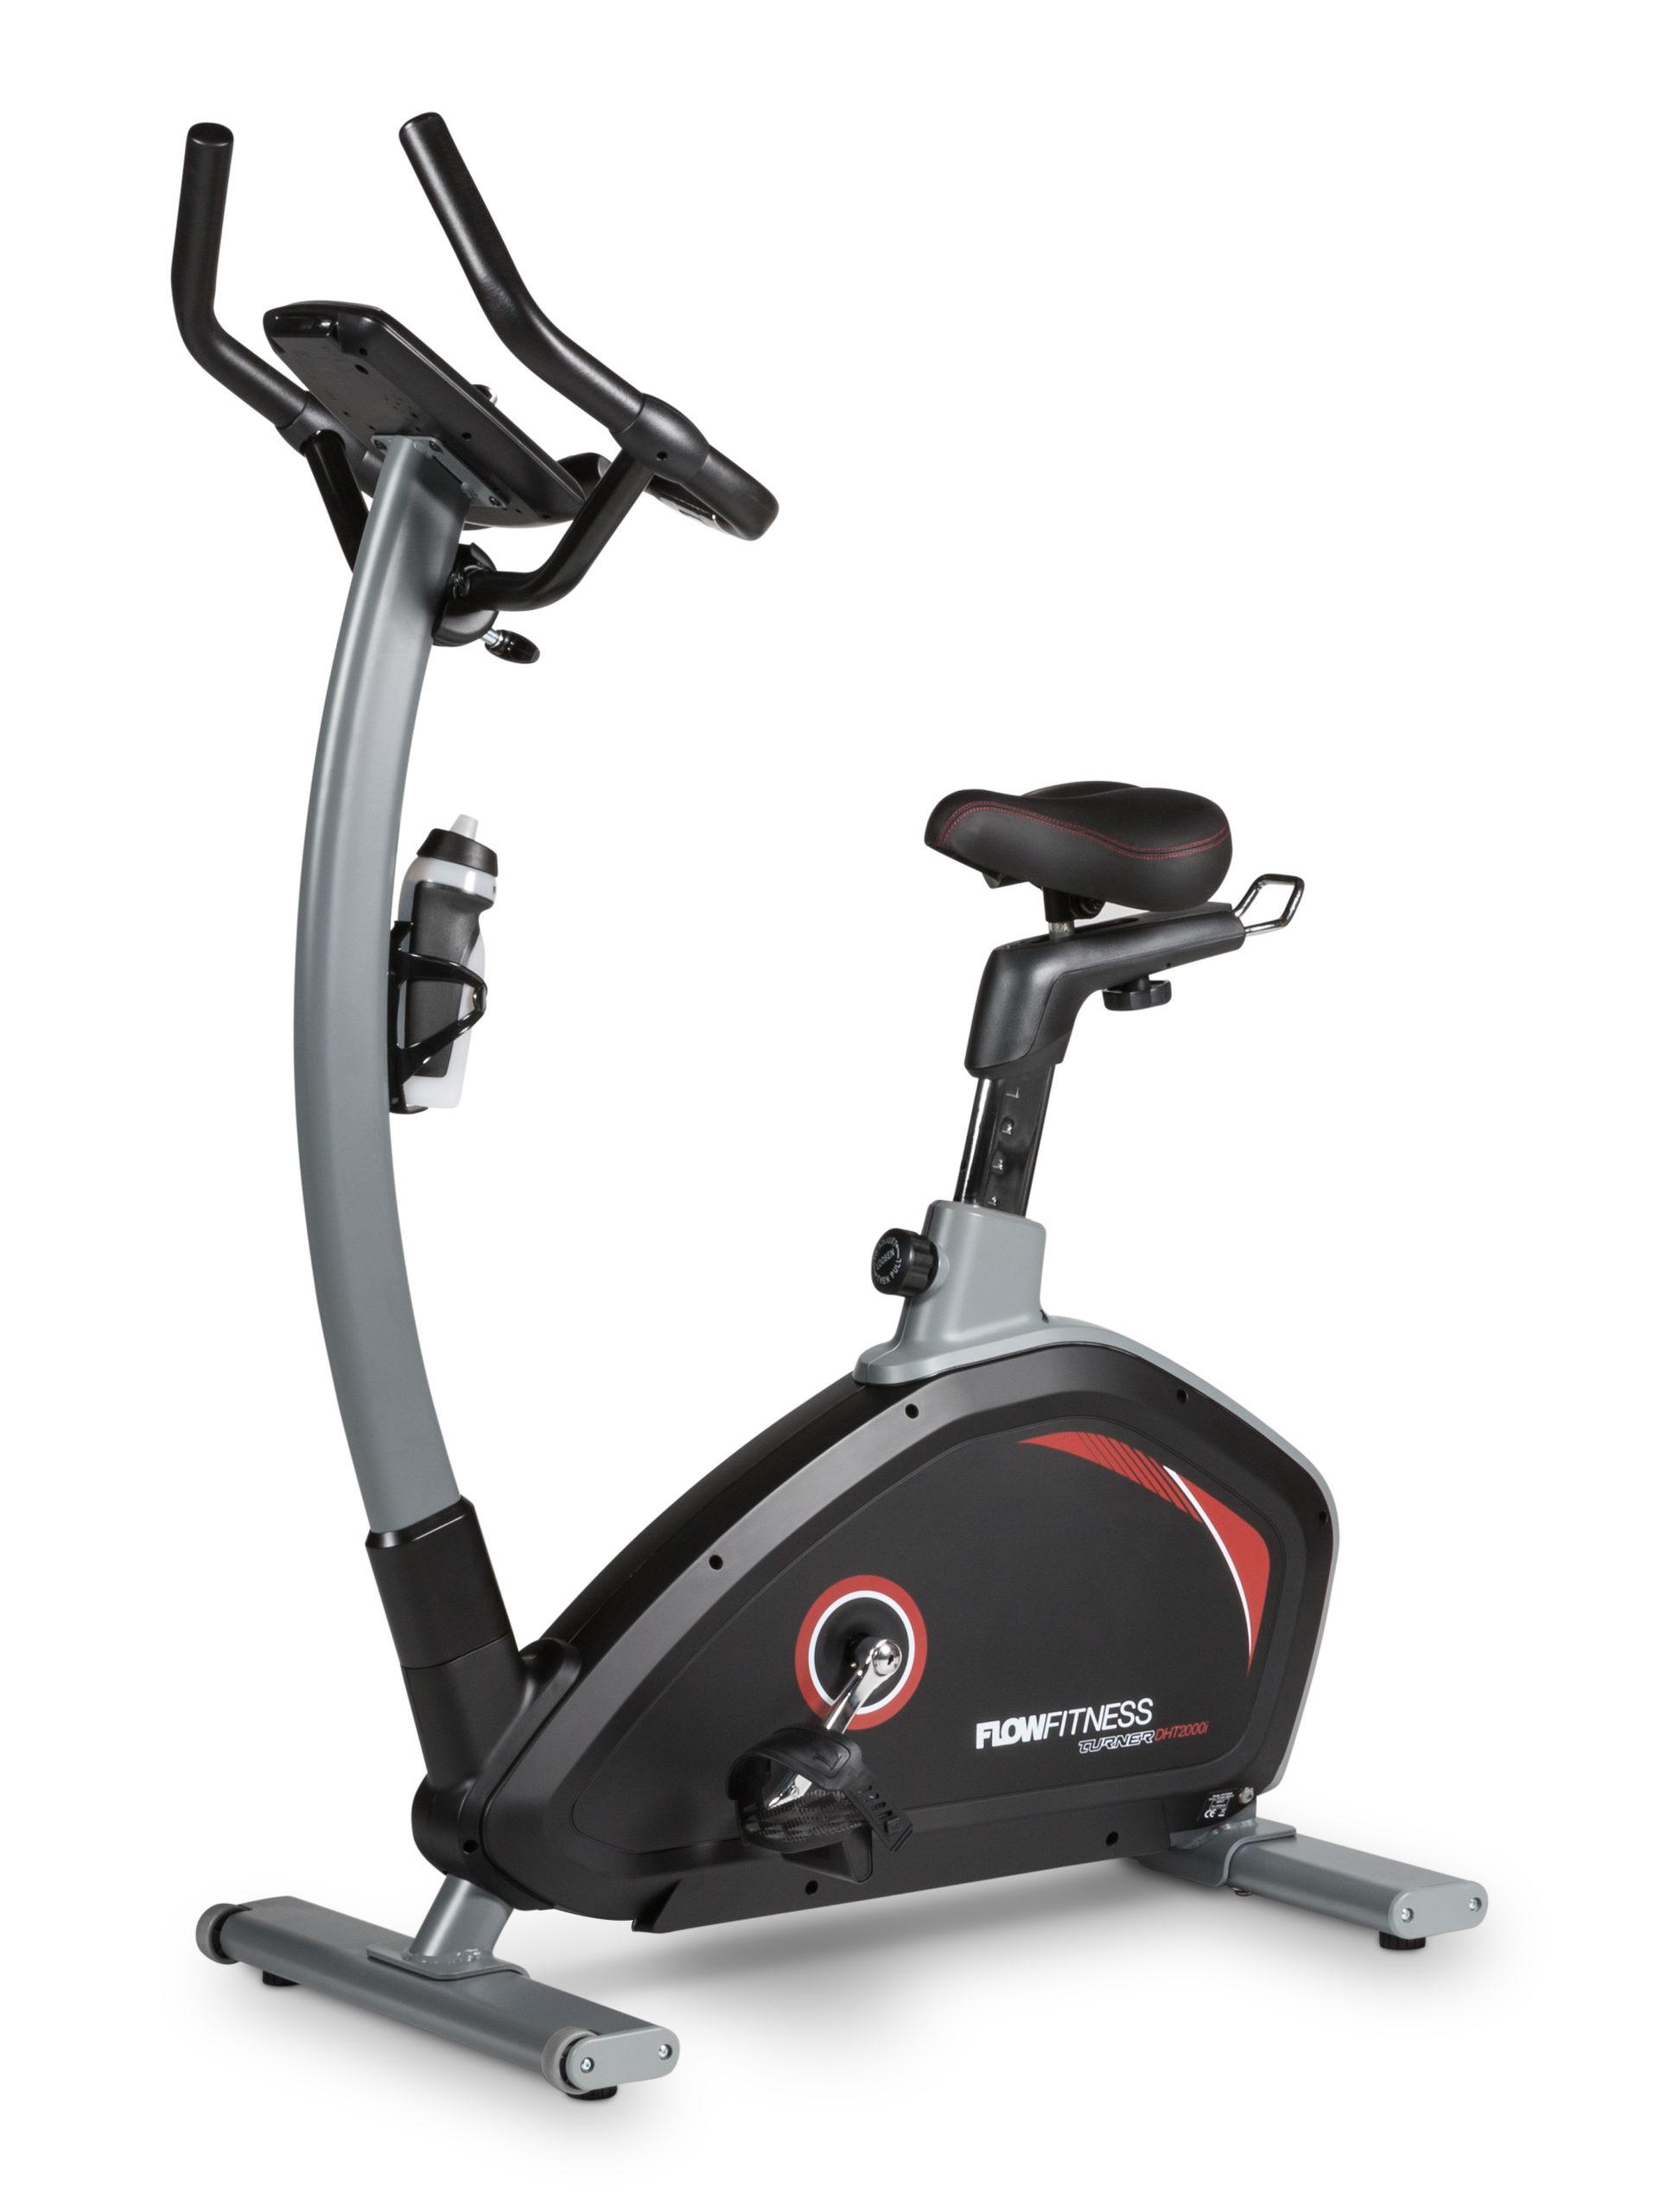 Flow Fitness Tabel Turner DHT2000i Hometrainer